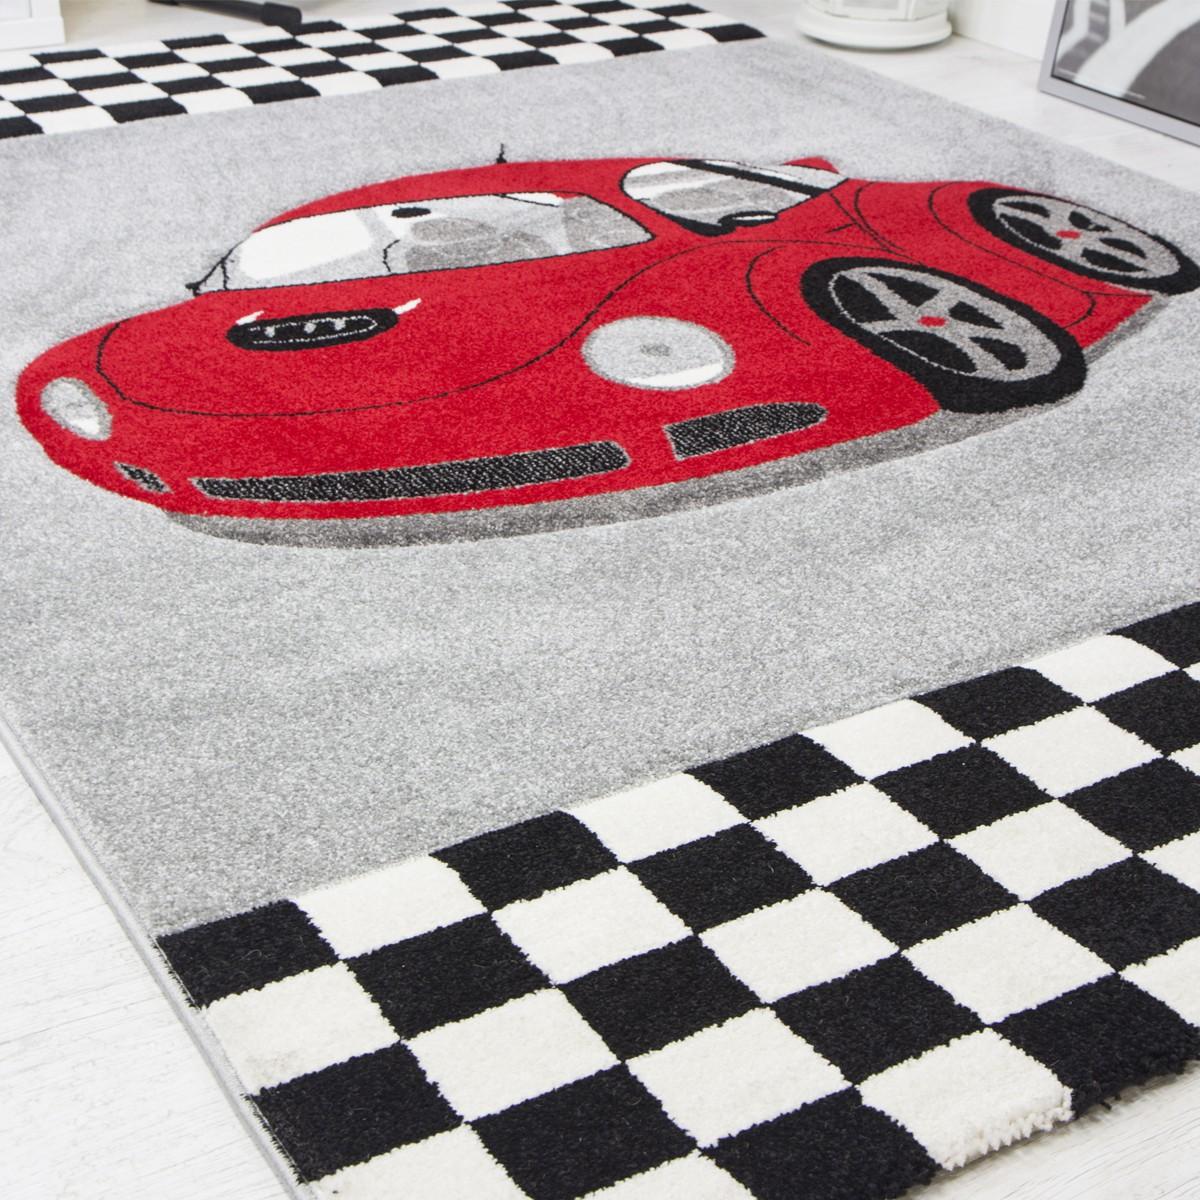 Modern Kinder Teppich Car Rennwagen in Rot Frisee  I6777